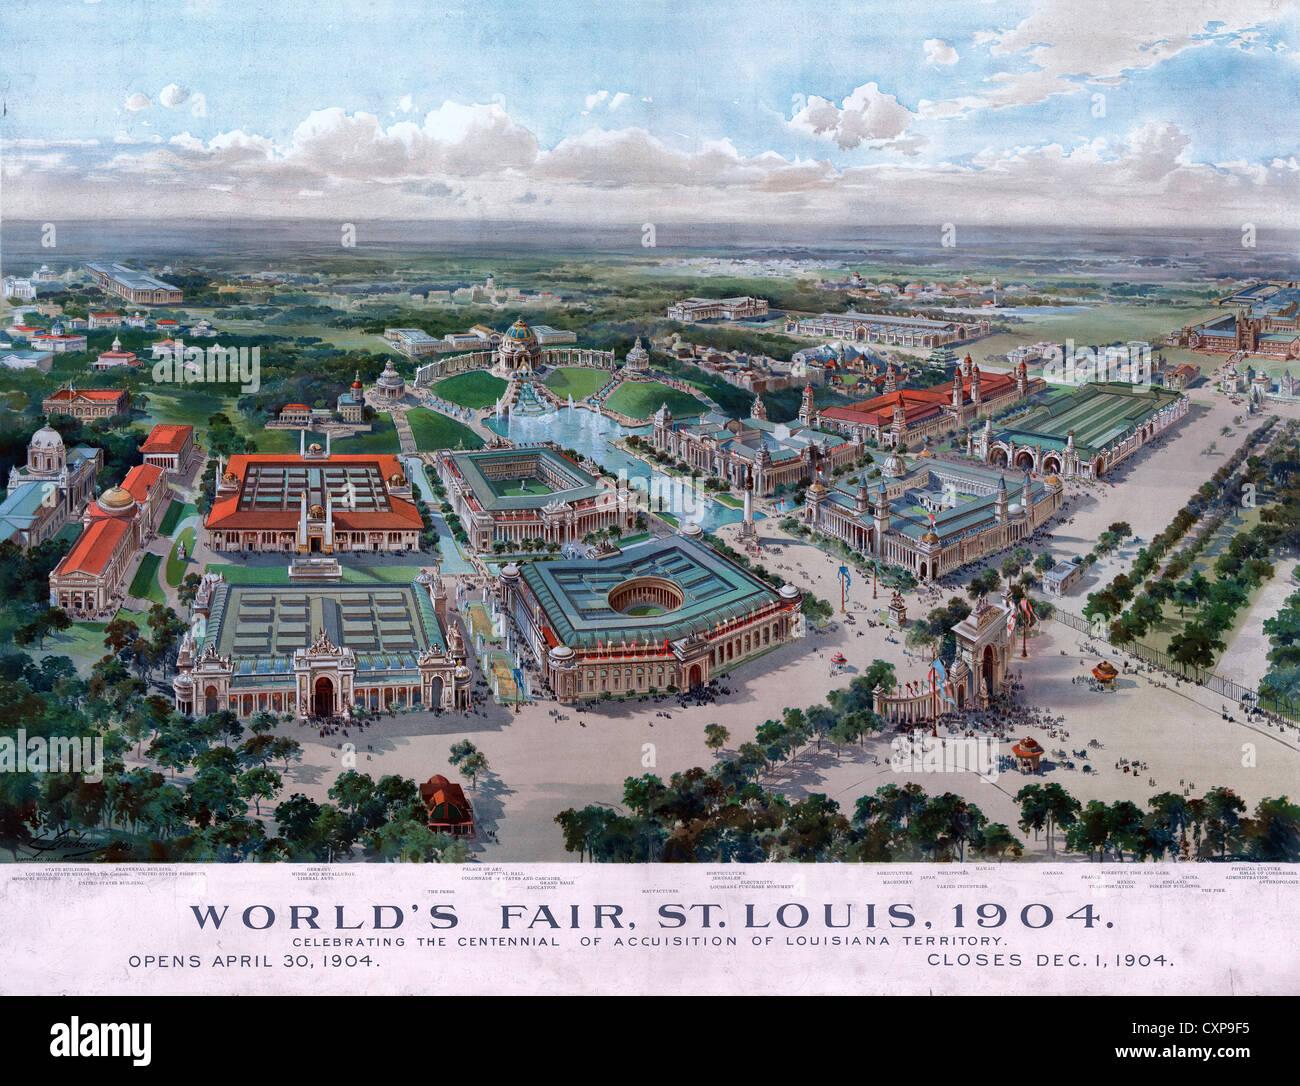 Map Aerial Birds Eye View St Louis Missouri Worlds Fair 1904 Canvas Art Print